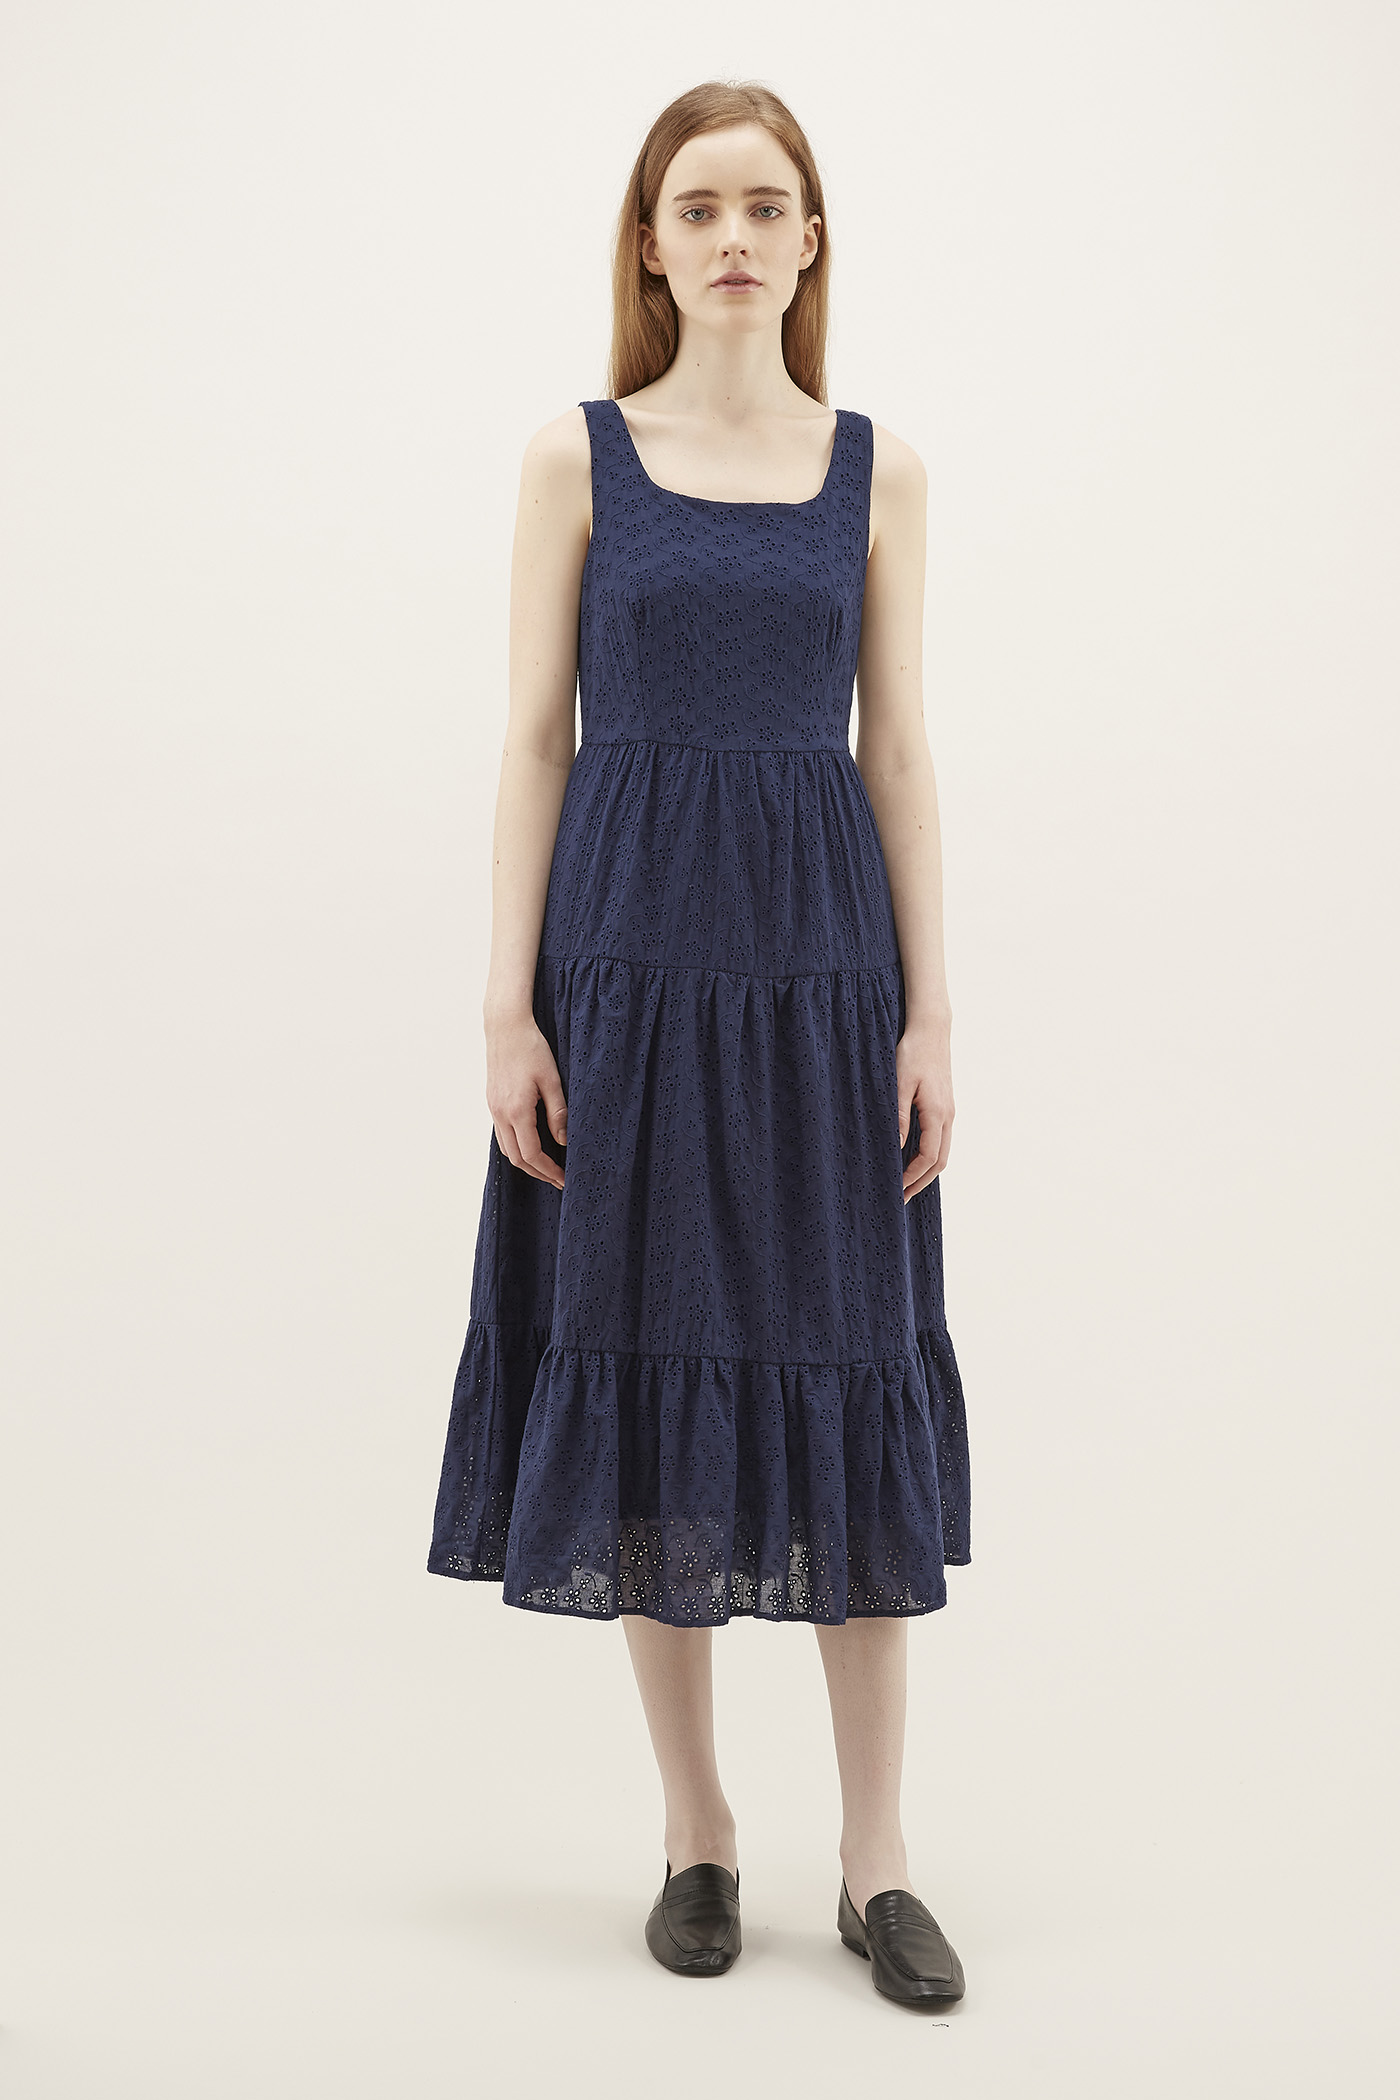 Kolina Broderie Tiered Dress